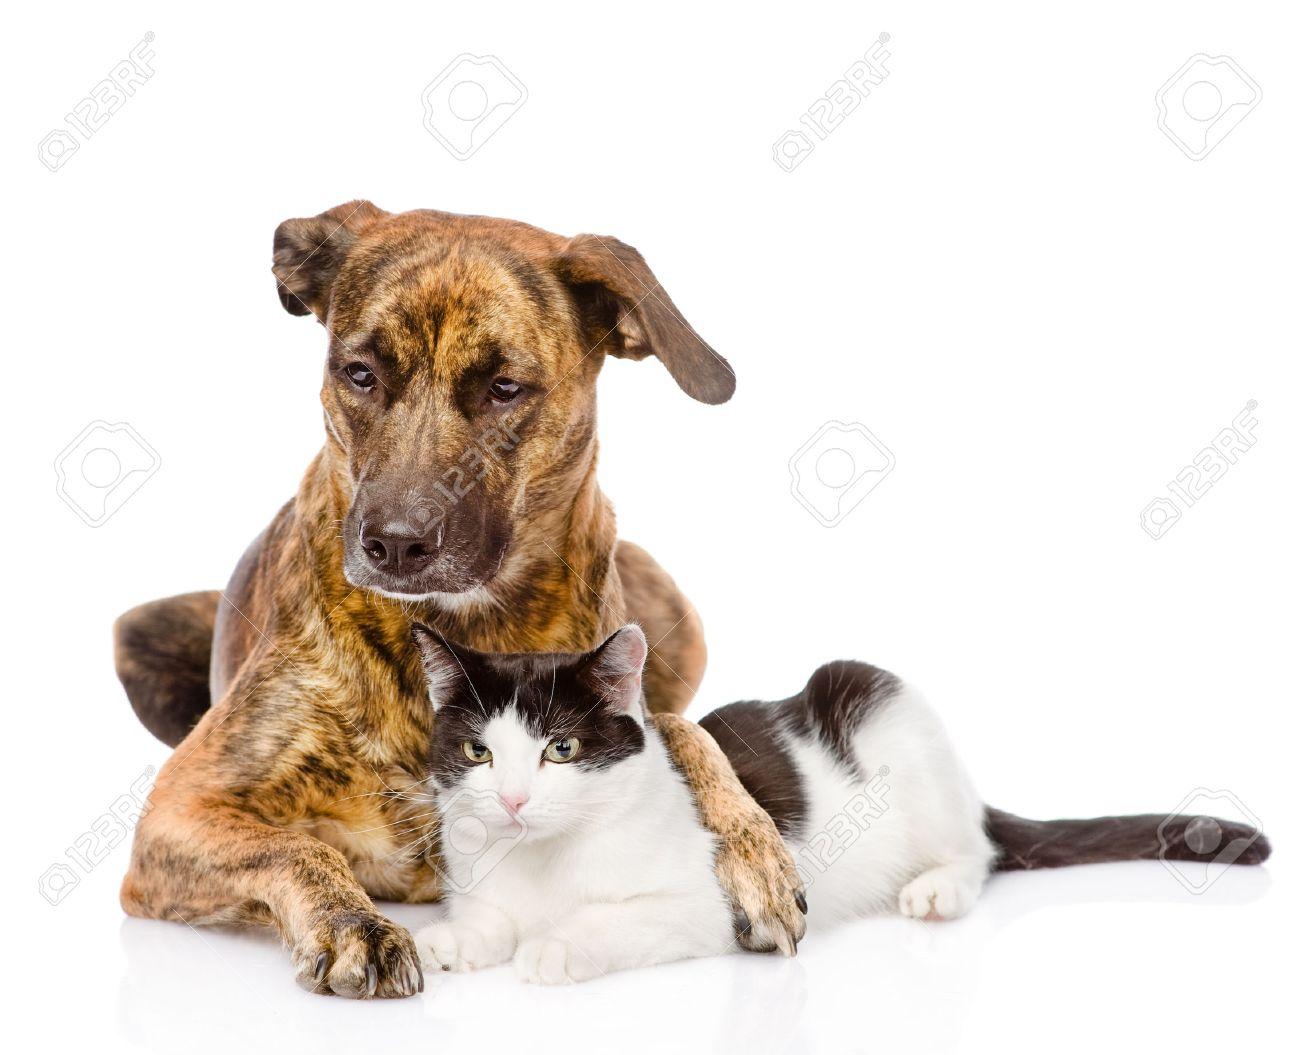 Cat Dog Breed Mix Mixed Breed Kitten Large Dog